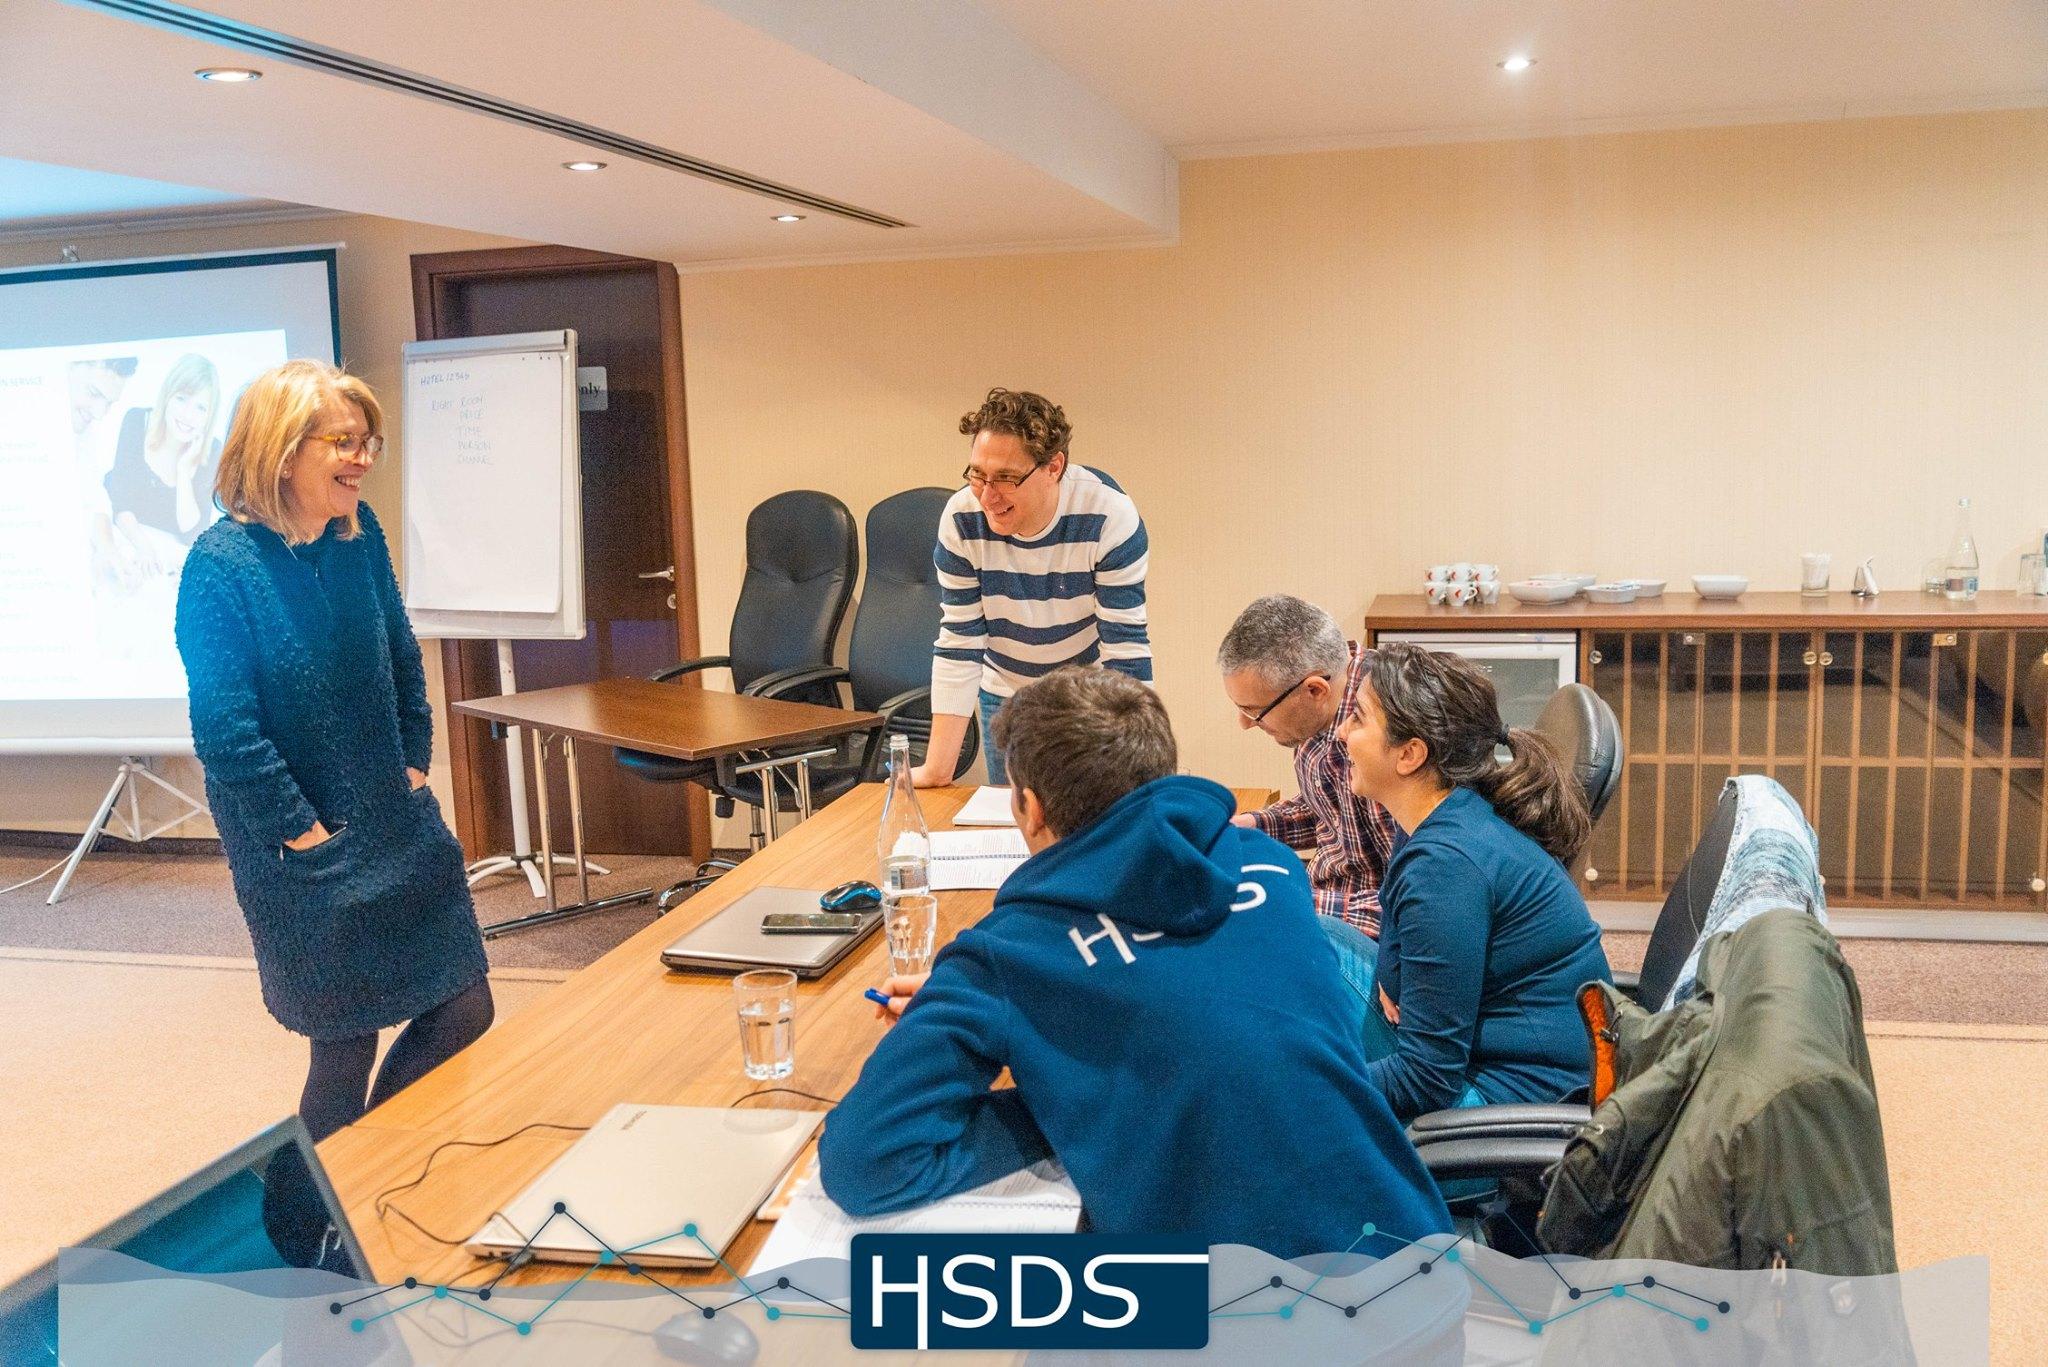 HSDS hotel revenue management training